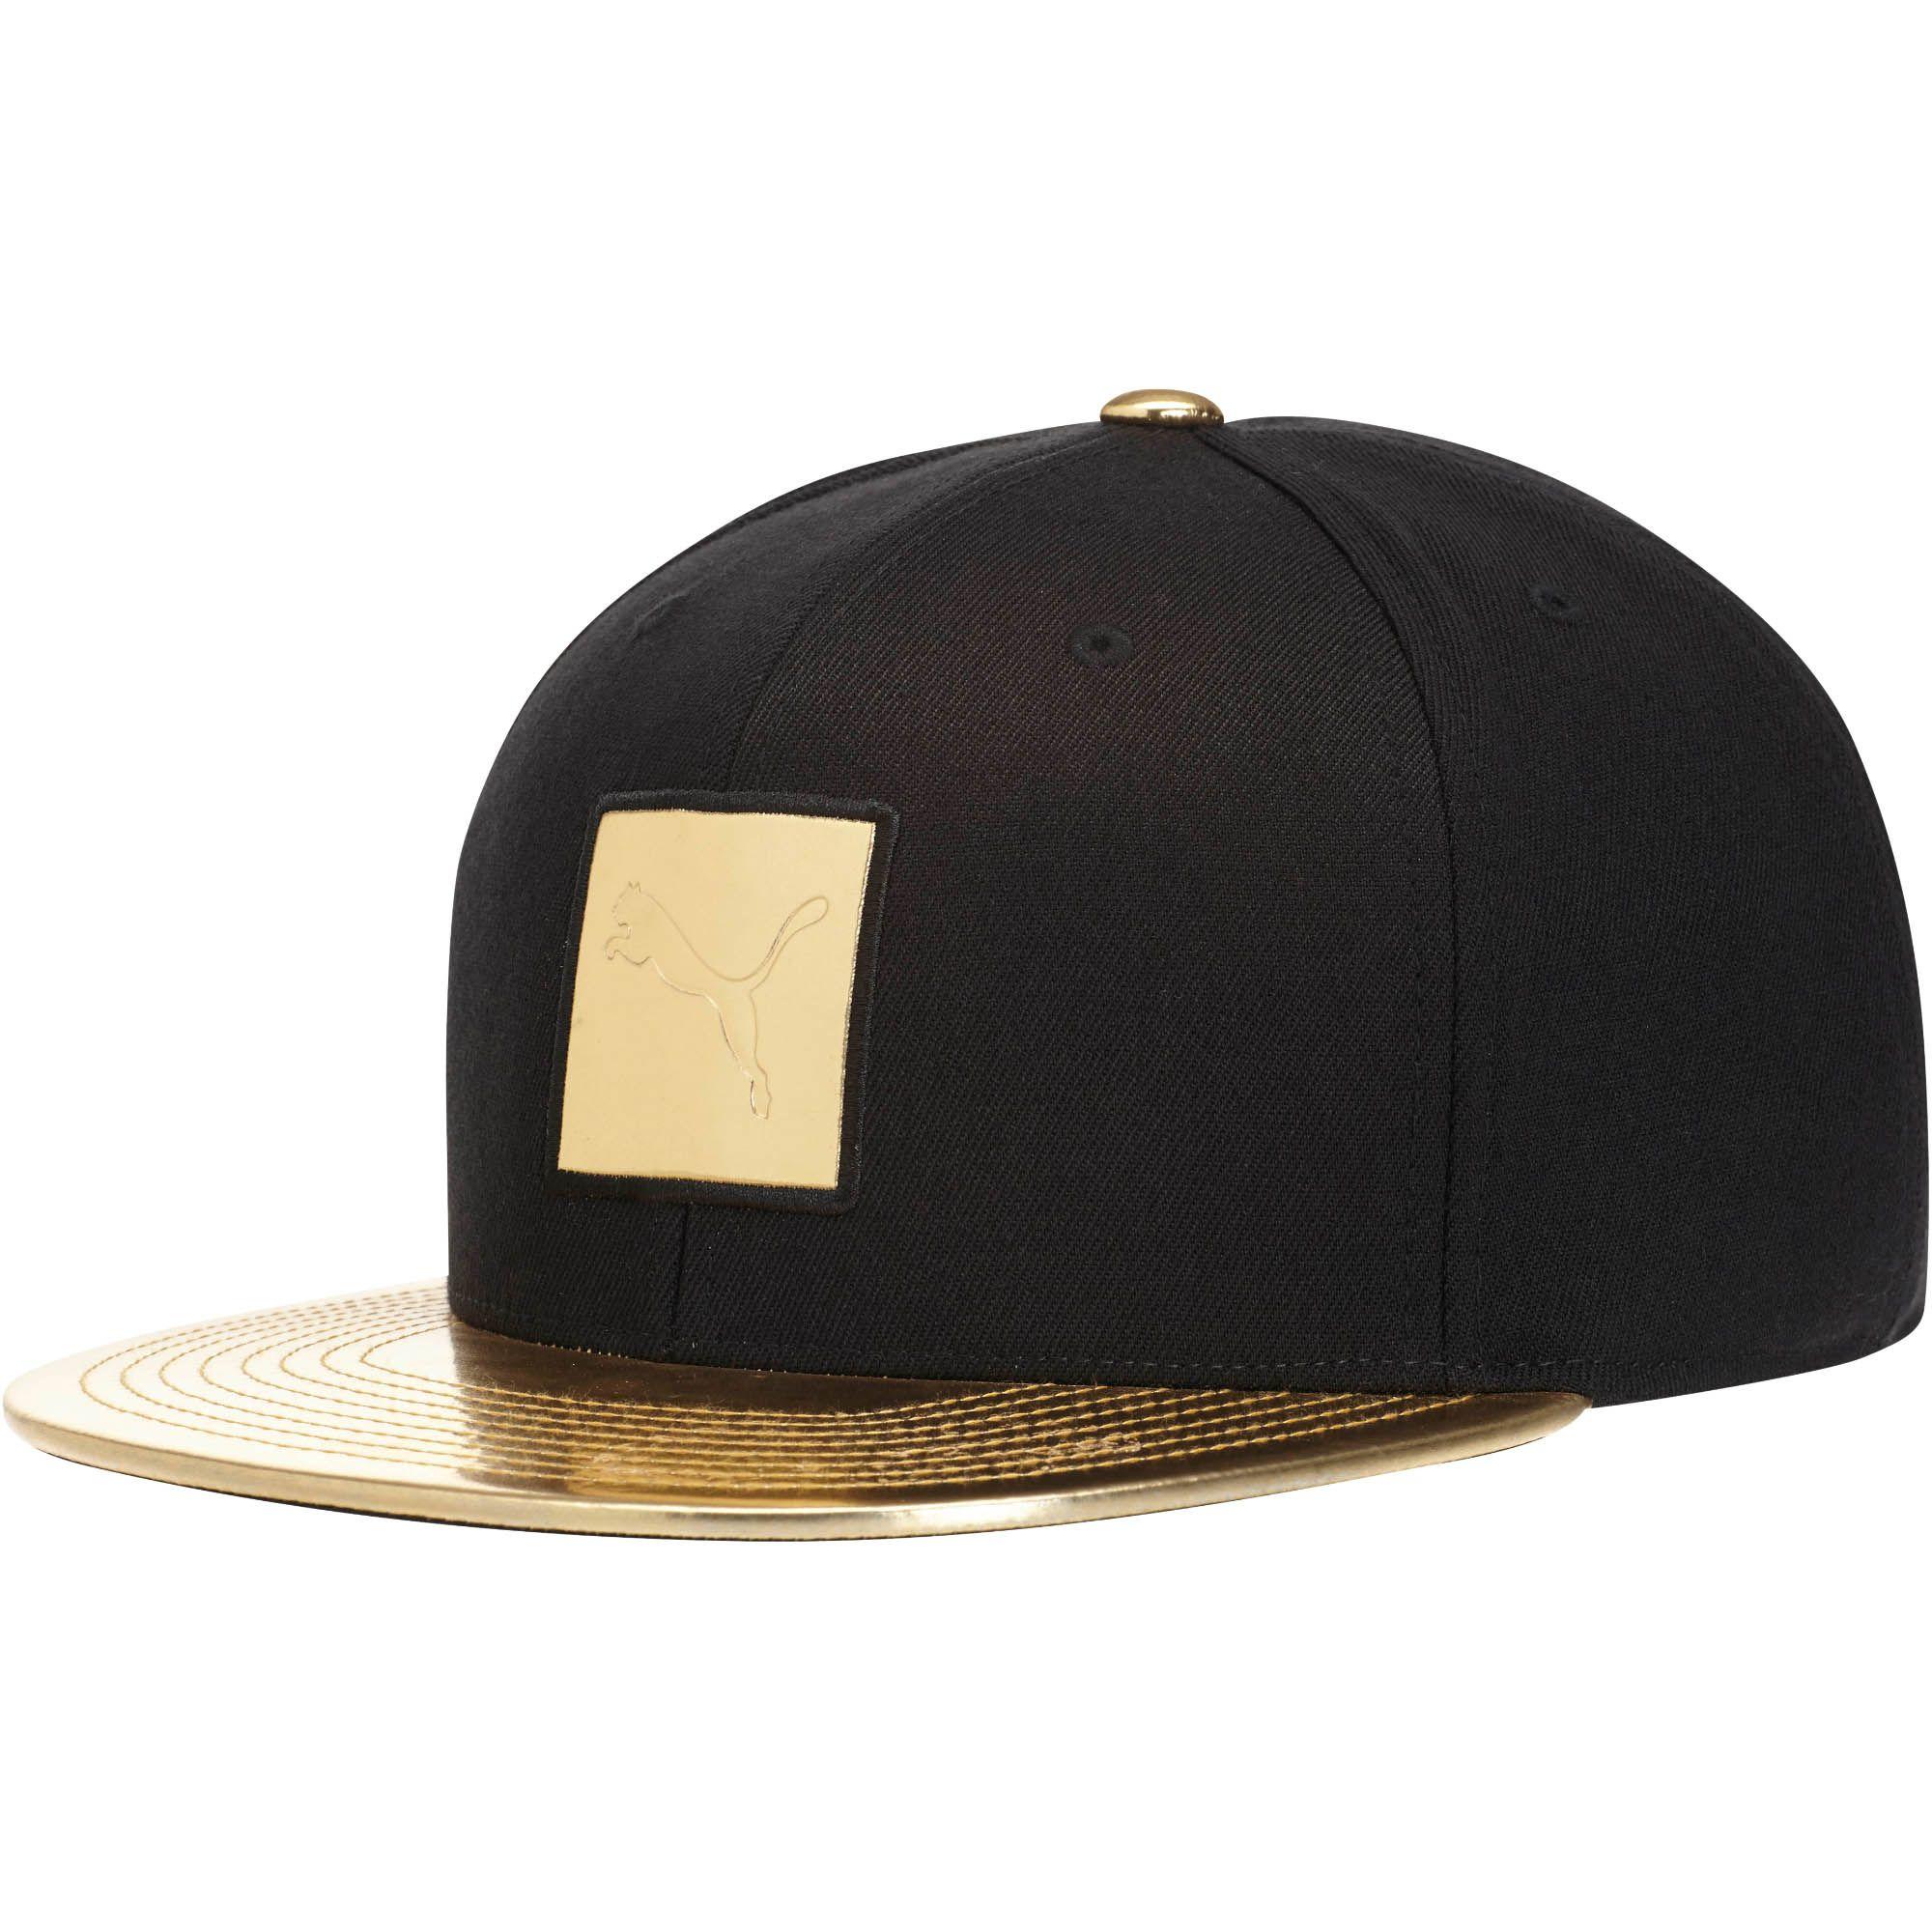 96129a74af6 Lyst - PUMA Cat Patch 110 Snapback Hat in Black for Men